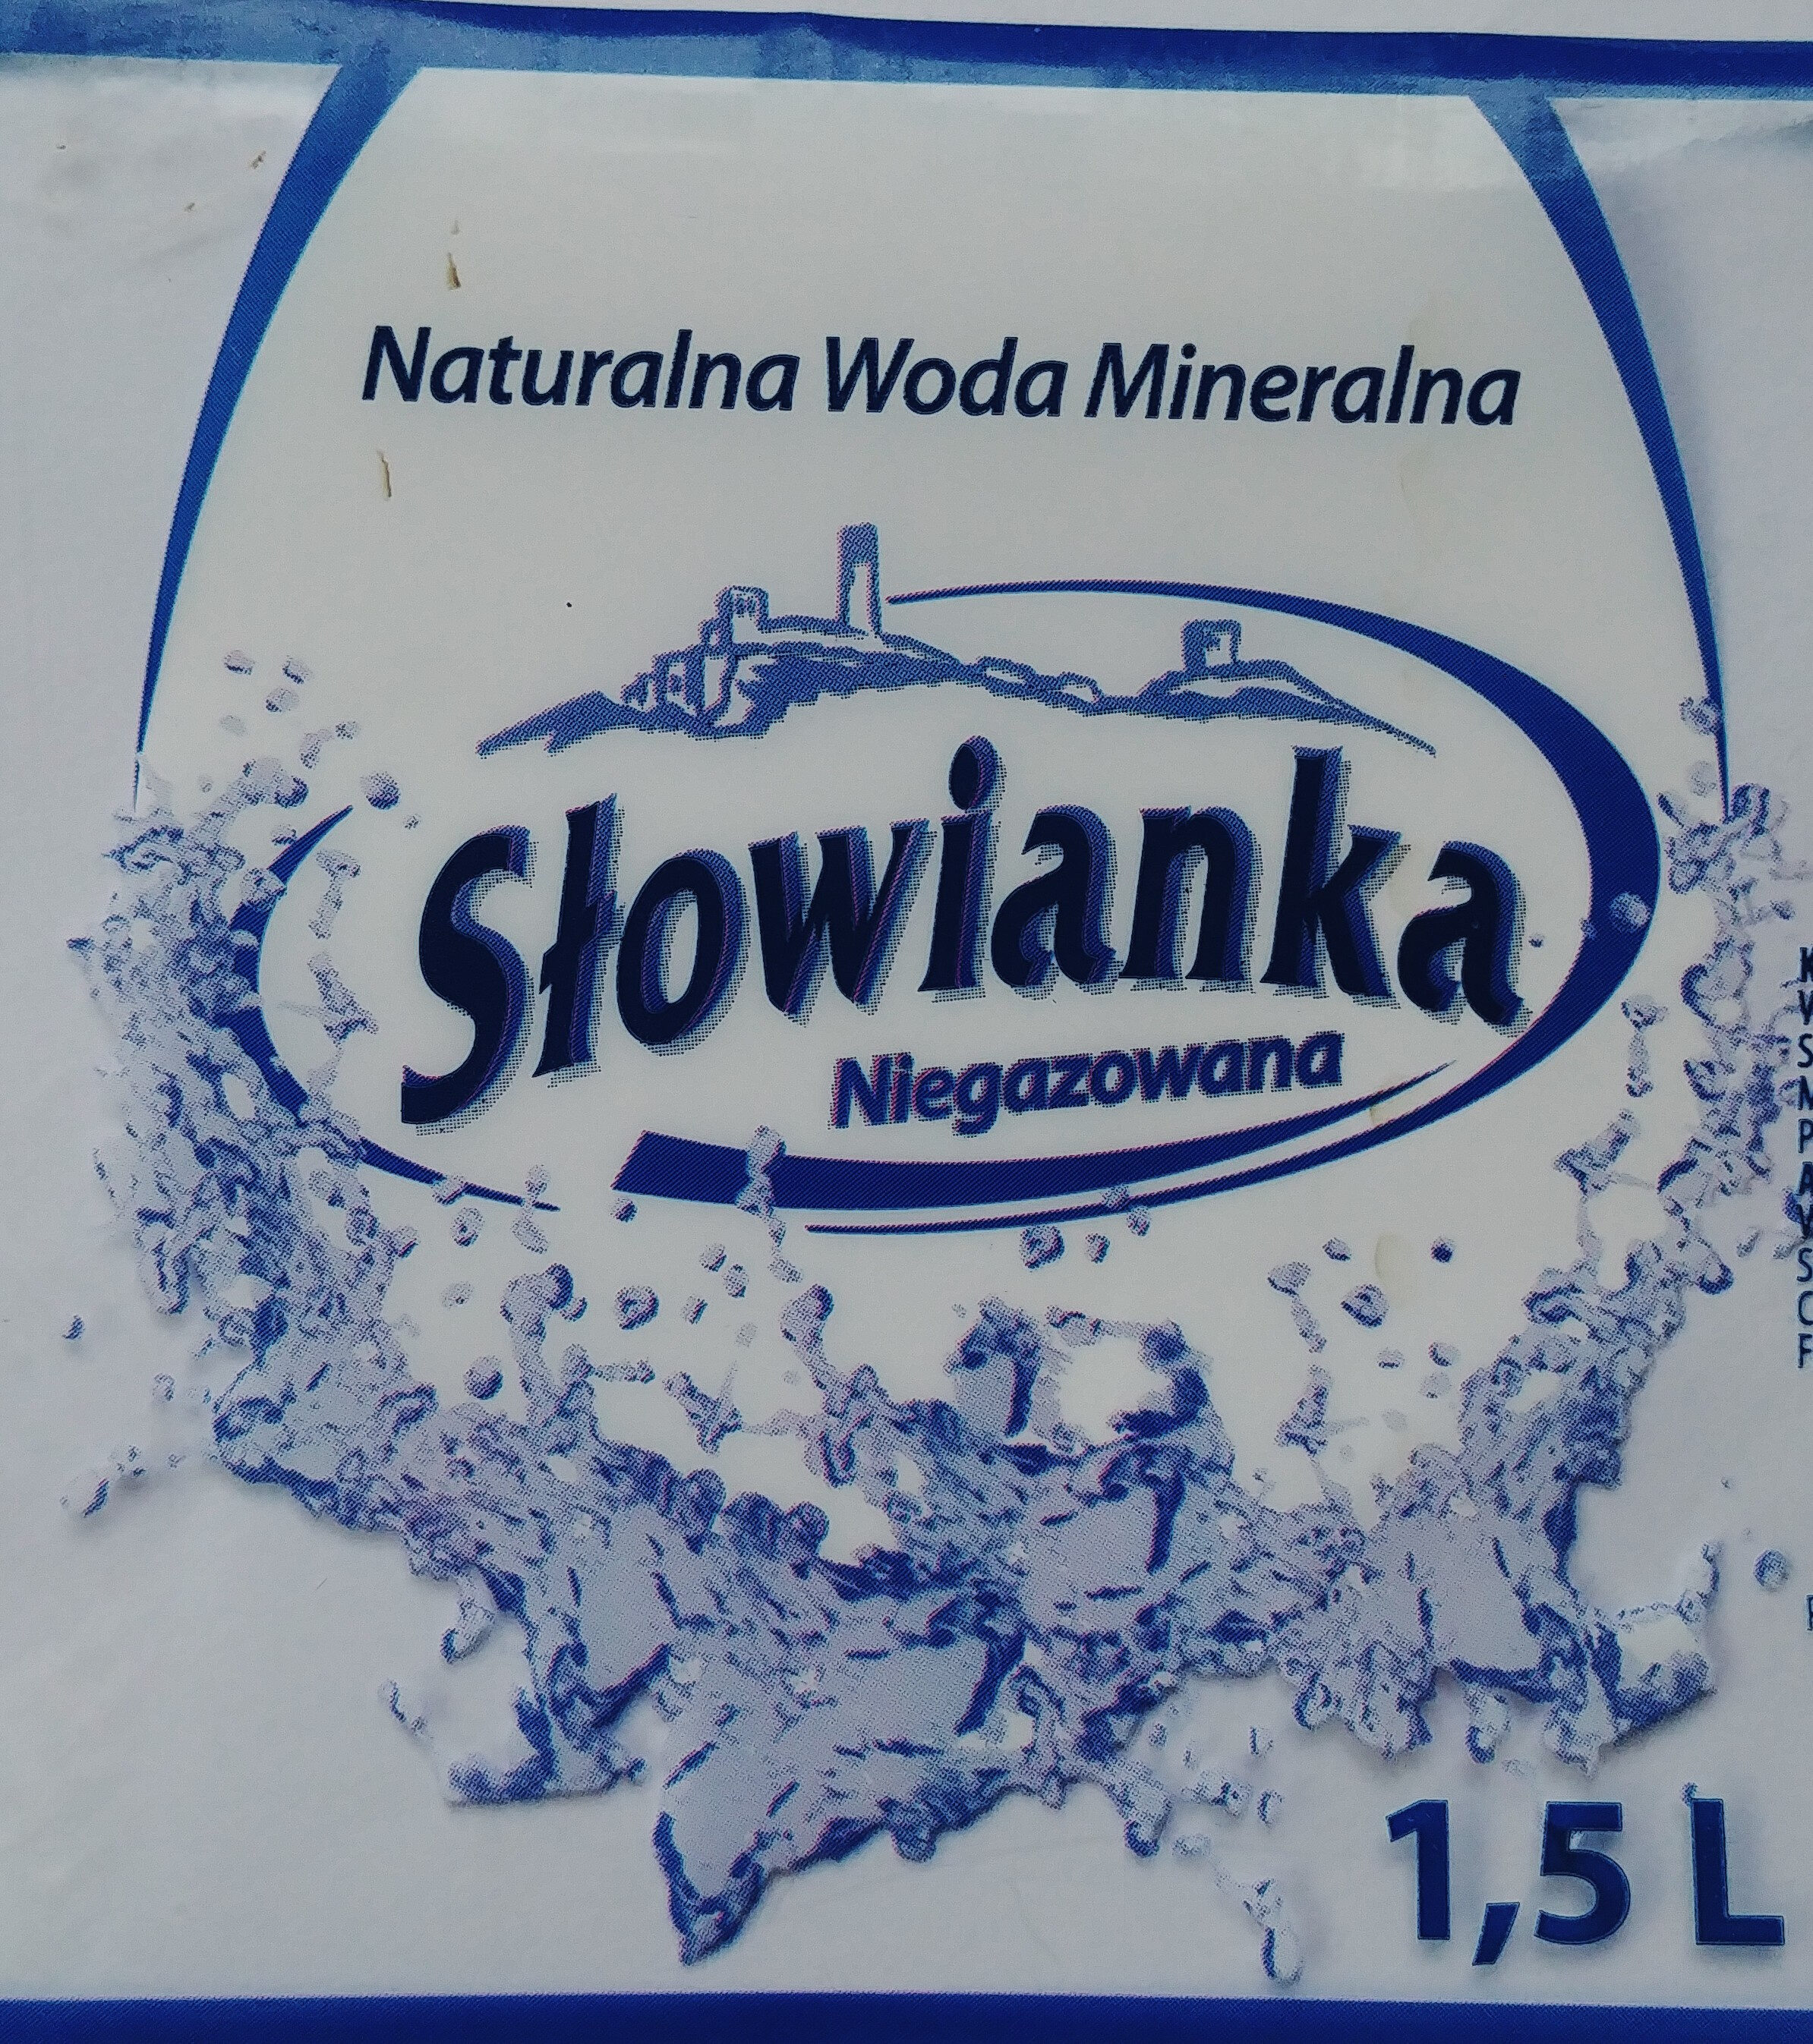 Naturalna woda mineralna niegazowana - Product - pl